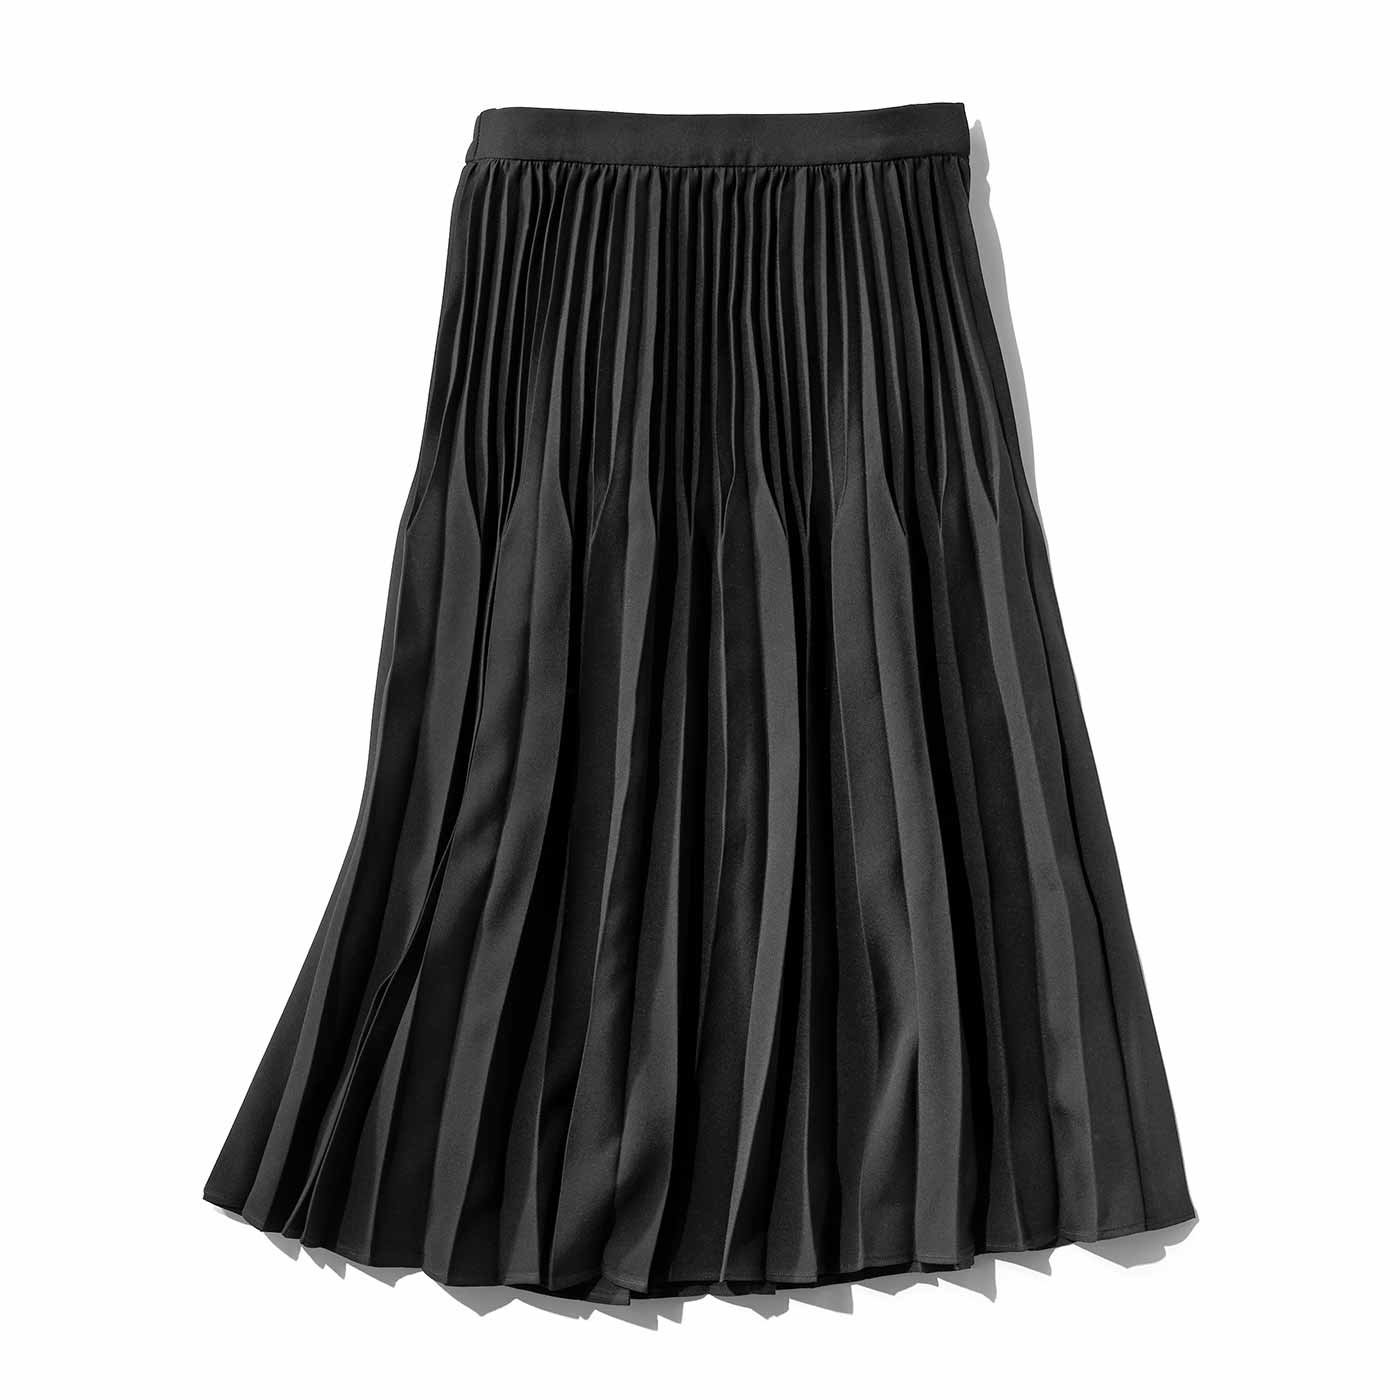 IEDIT 立体シルエットの二段切り替え プリーツスカート〈ブラック〉